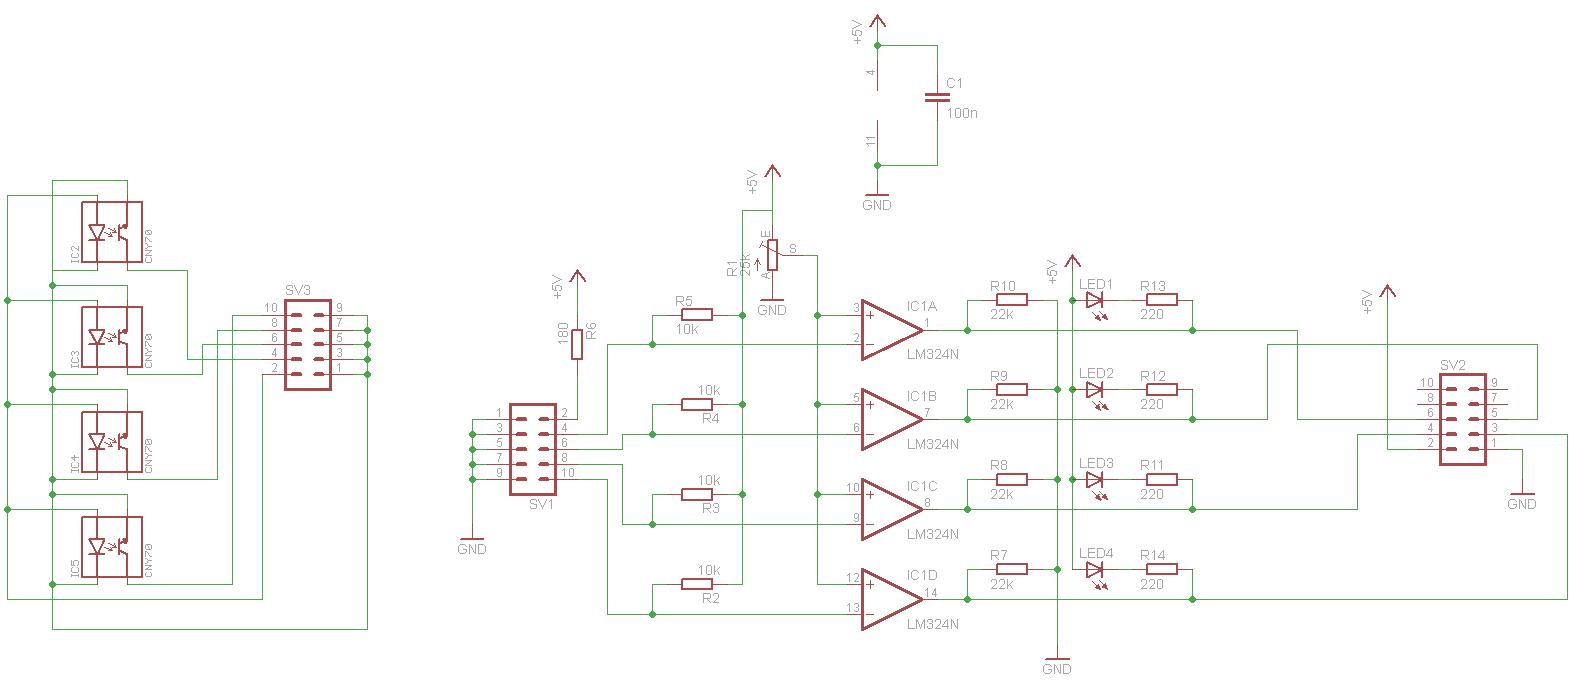 Lm324 Cny70 Unempfindlich Lm324n Circuit Preview Image For Schaltplan